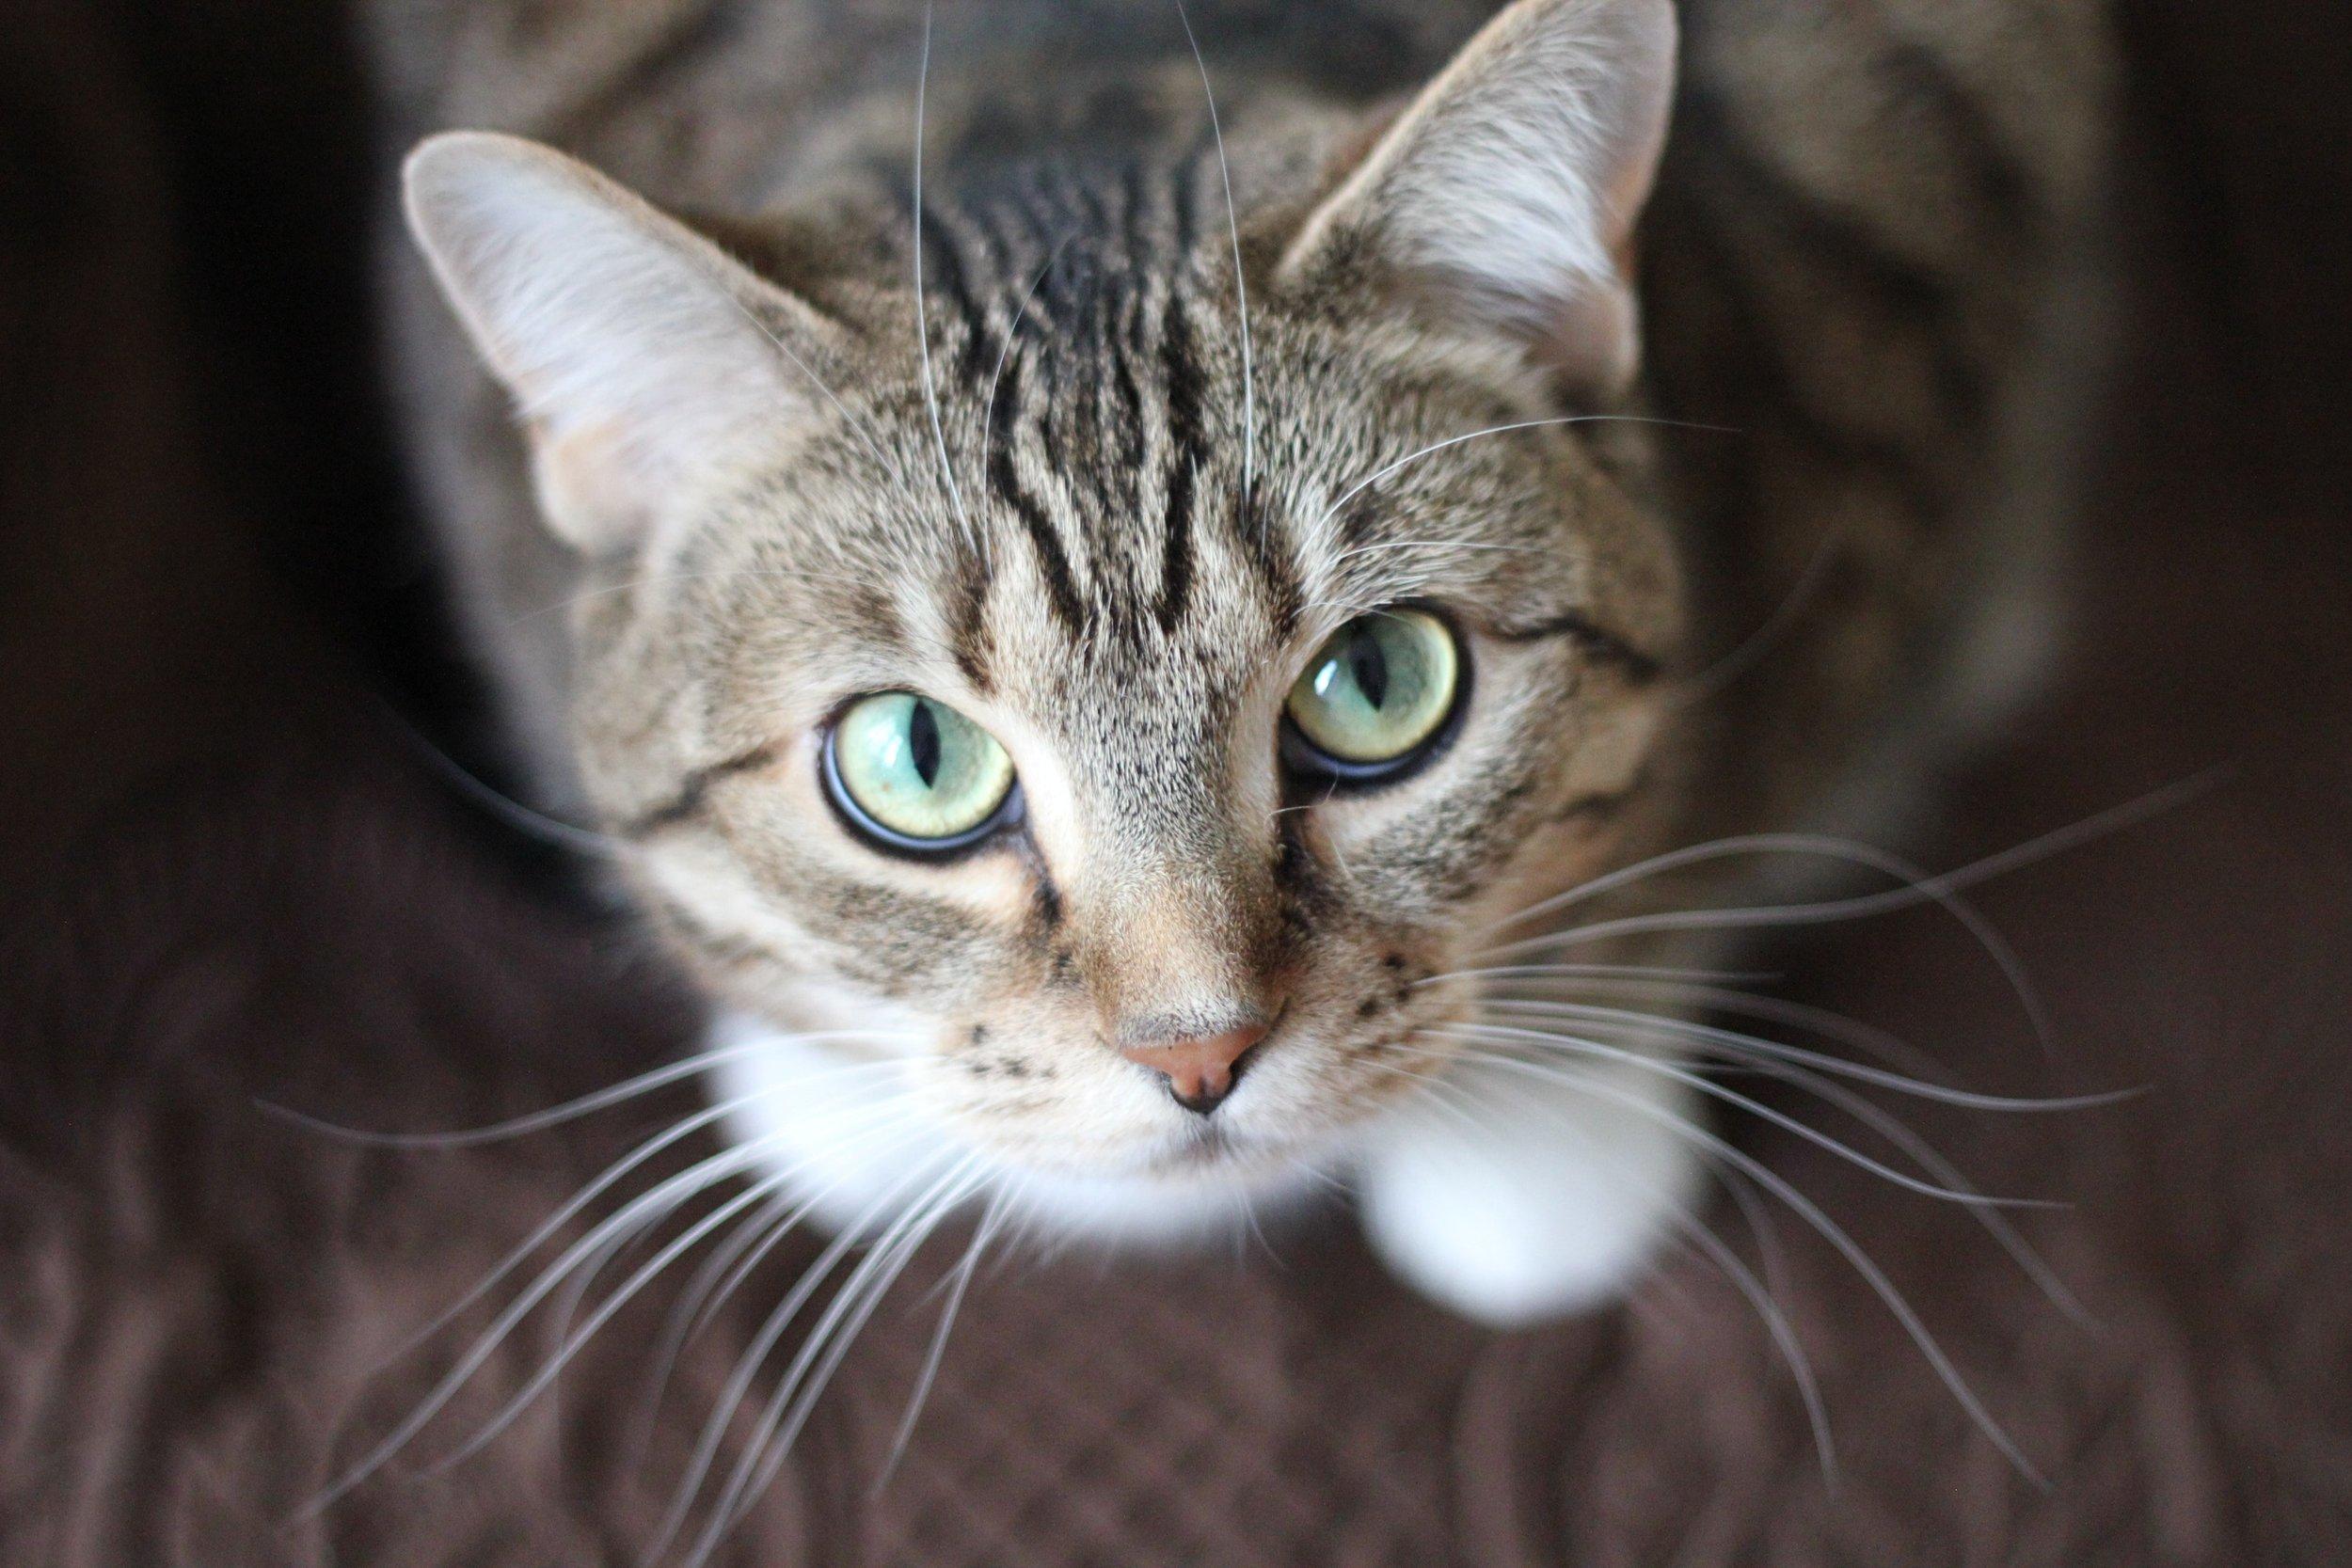 adorable-animal-cat-20787.jpg